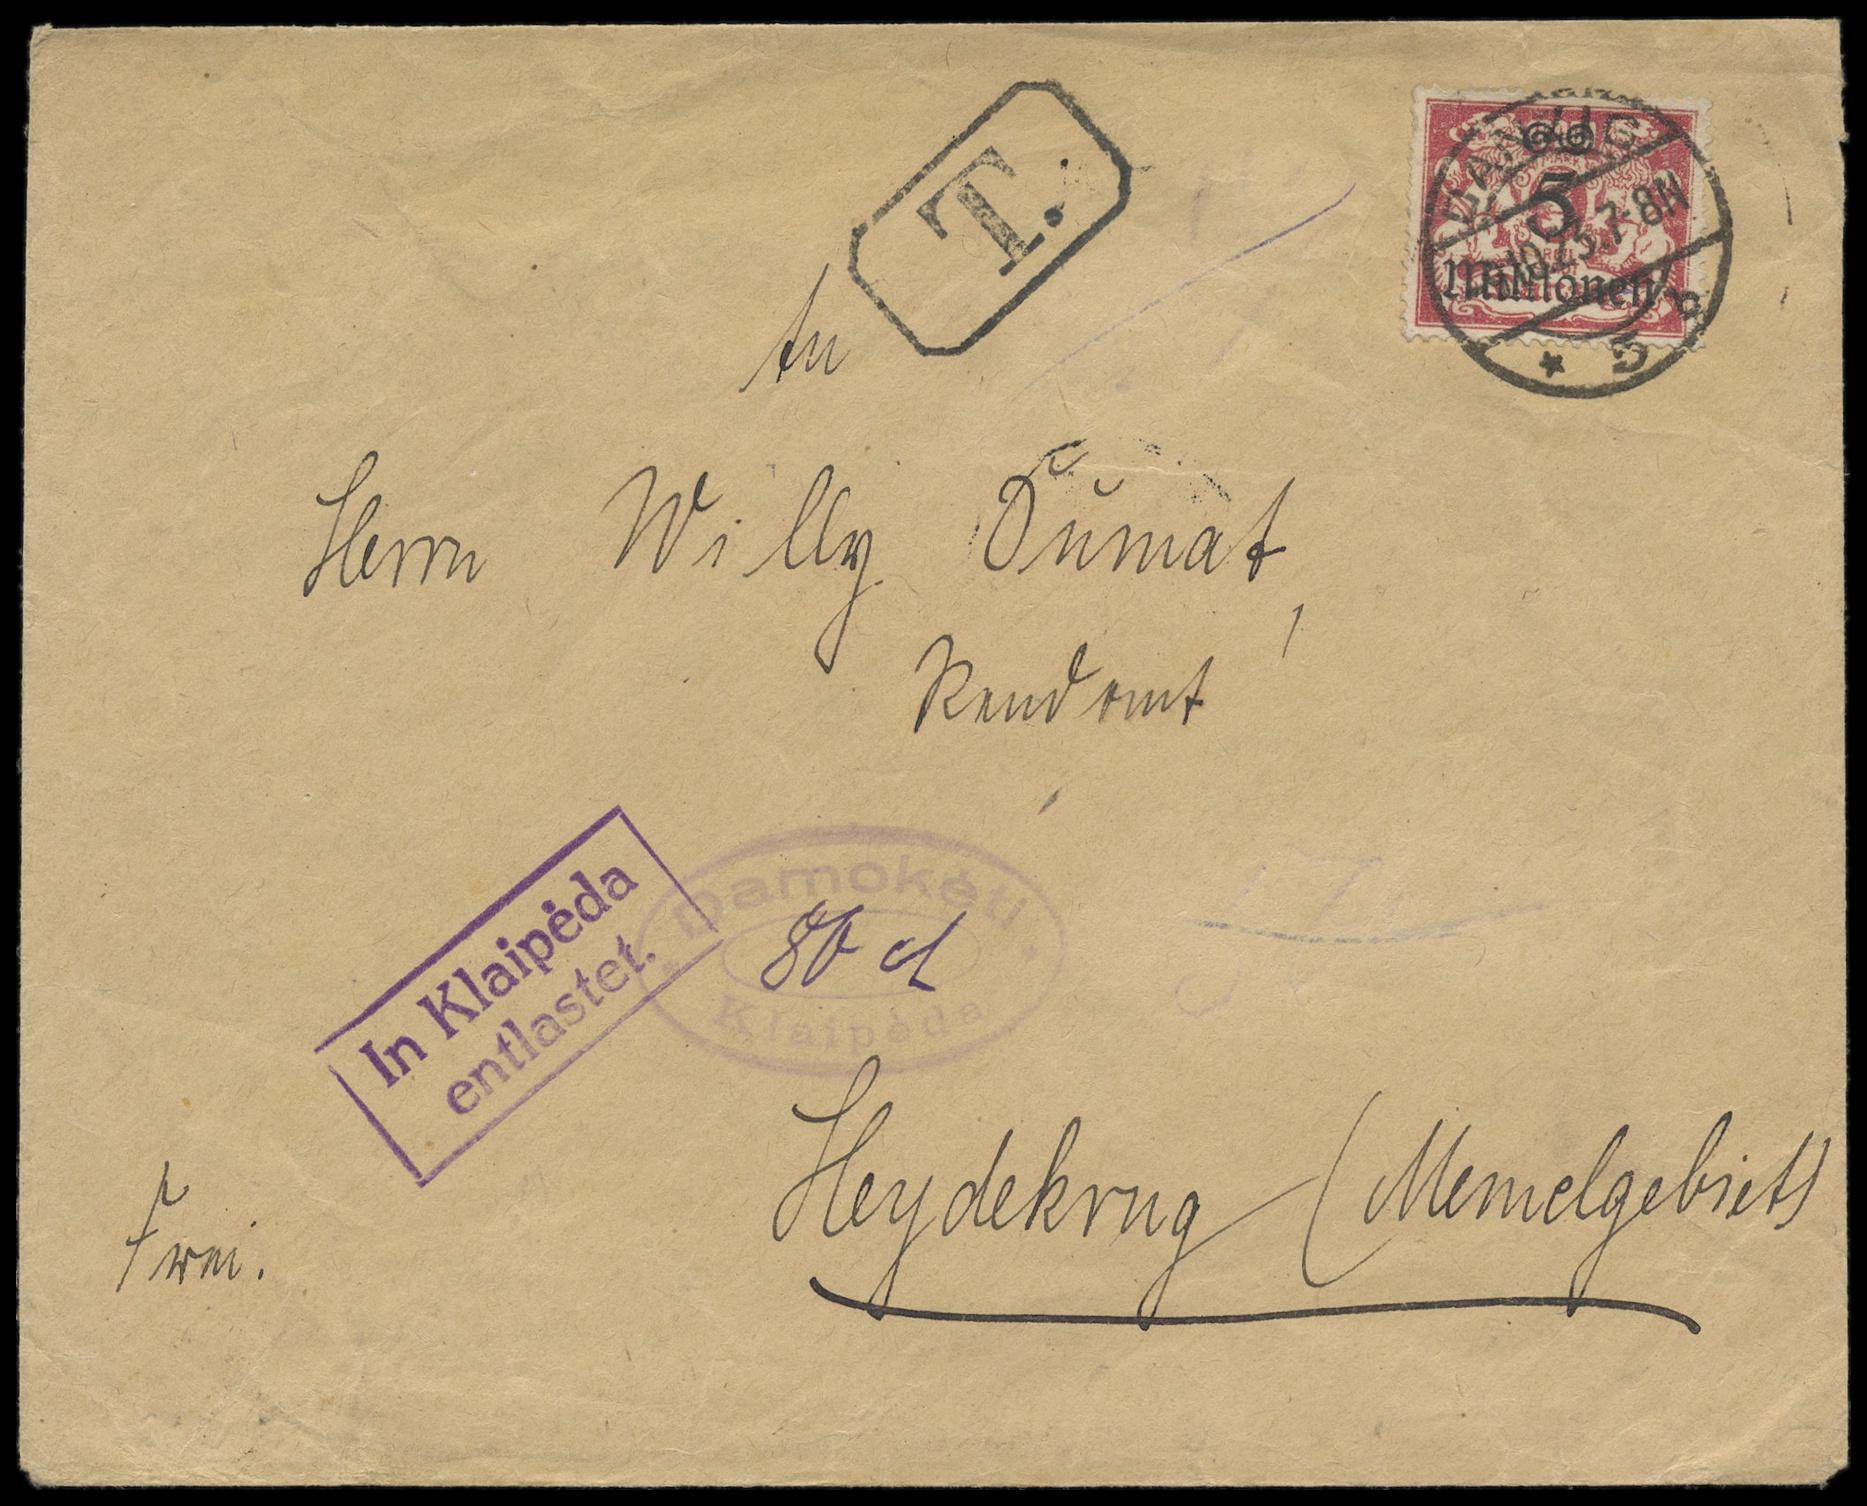 Lot 2431 - Main catalogue Memel -  Peter Harlos Auctions 42. Harlos Auktion